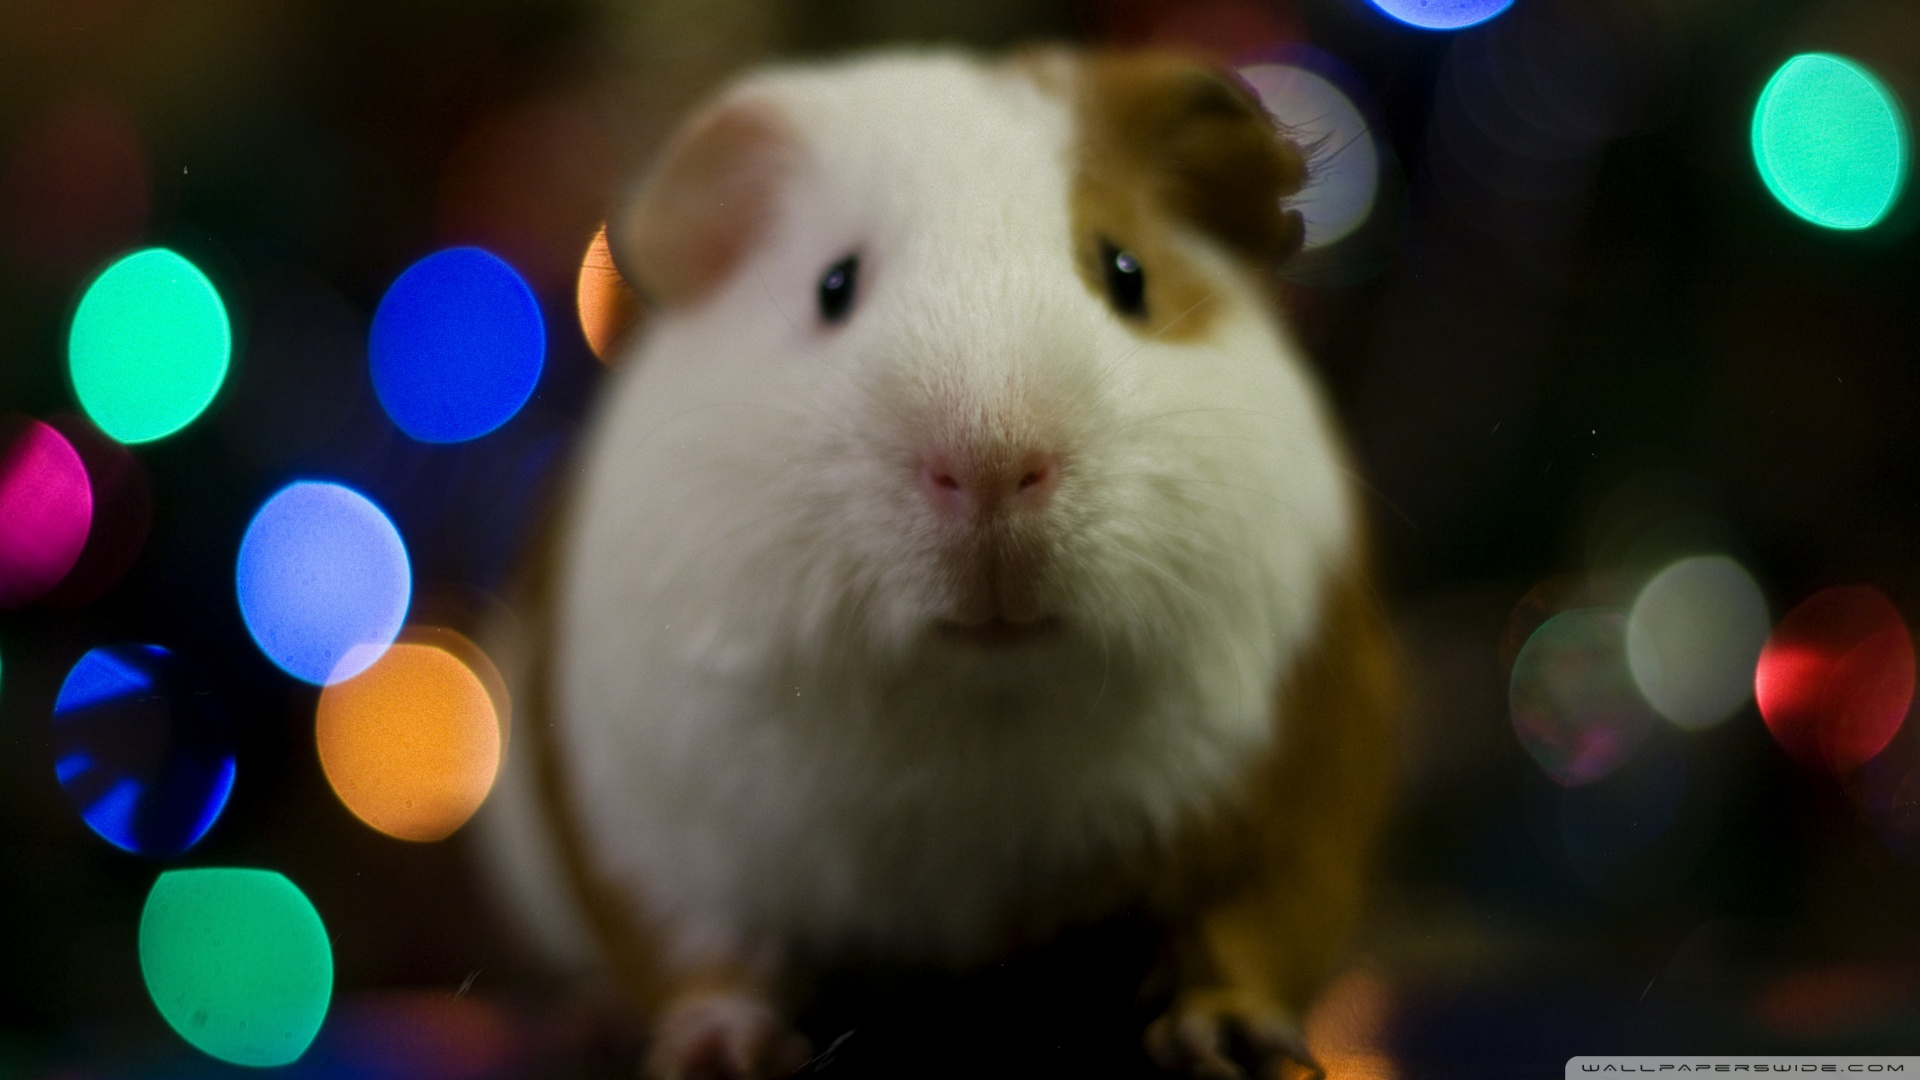 Cute Pig Wallpaper Hd Guinea Pig Christmas 4k Hd Desktop Wallpaper For 4k Ultra